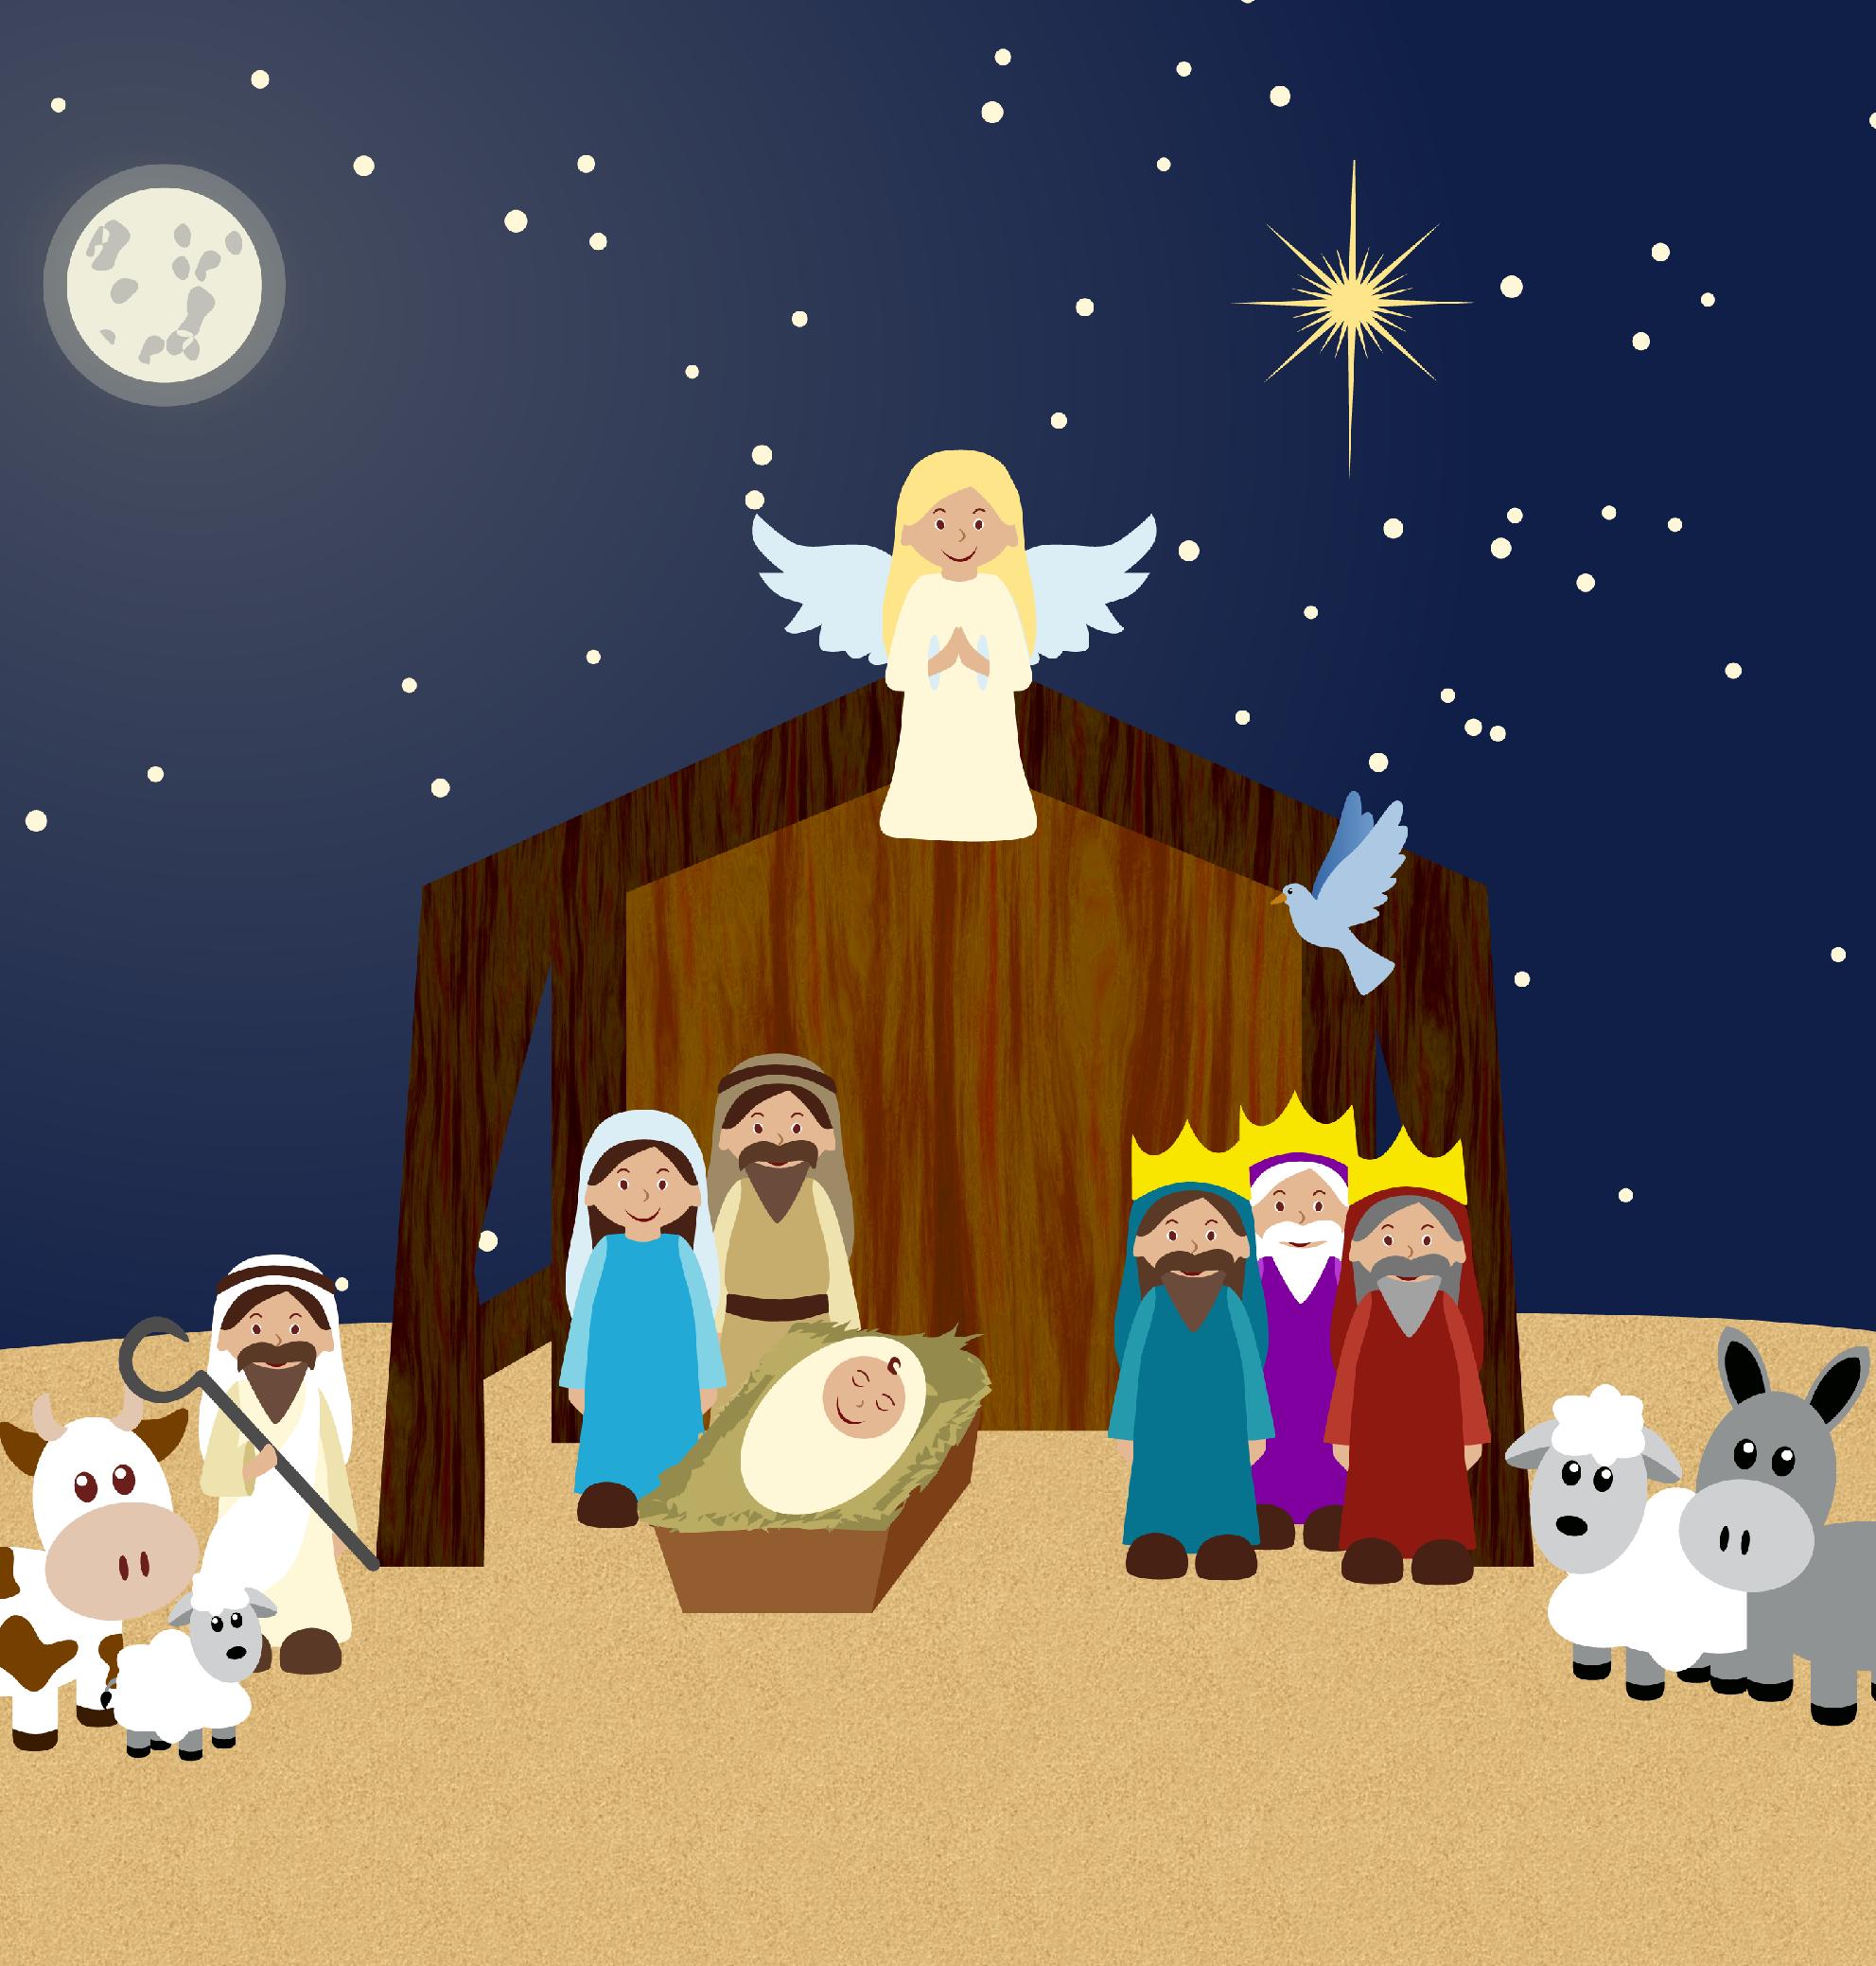 Nativity Clipart, nativity clip art, nativity scene clipart.